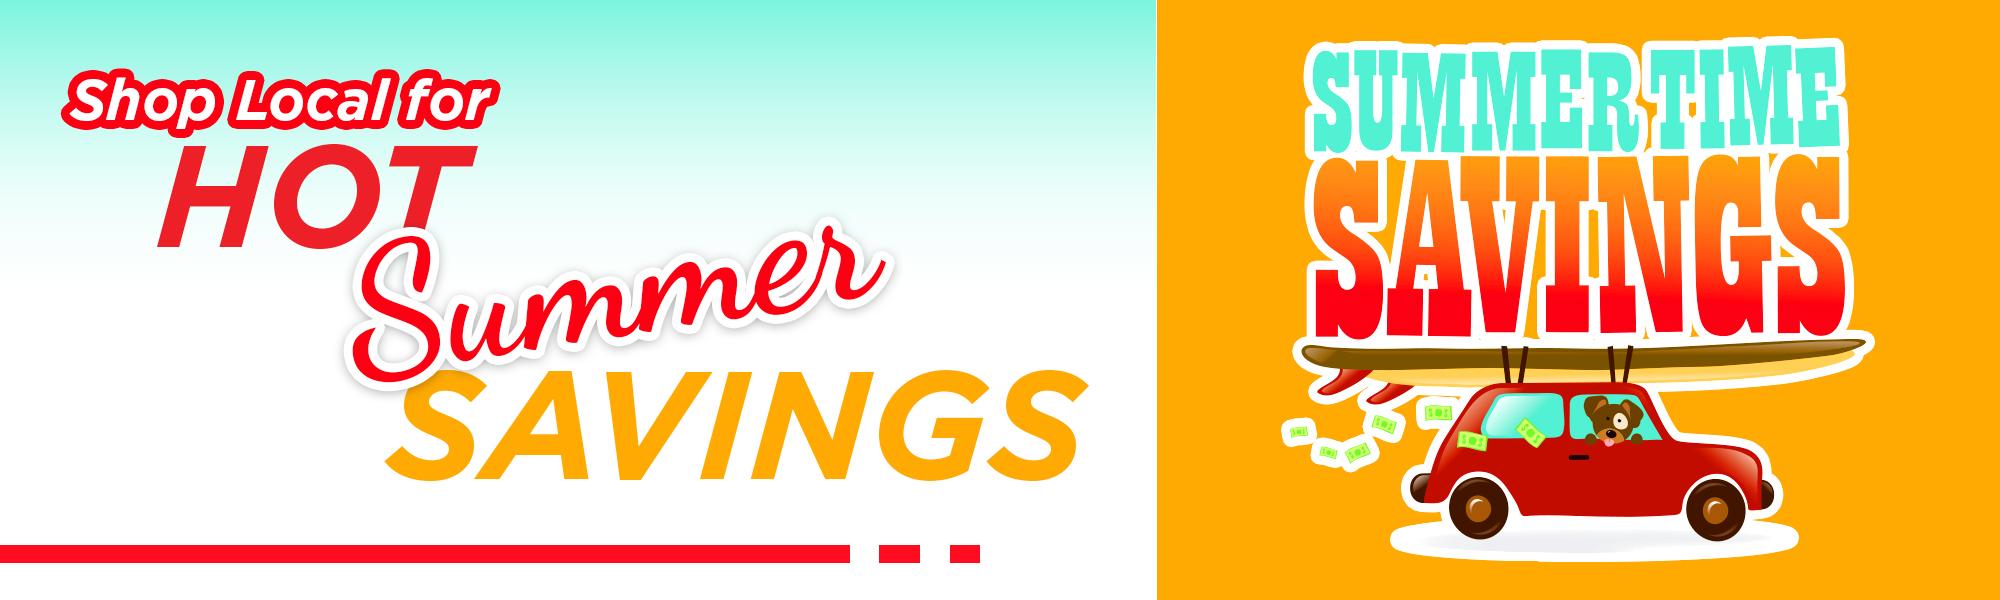 Summer Savings banner